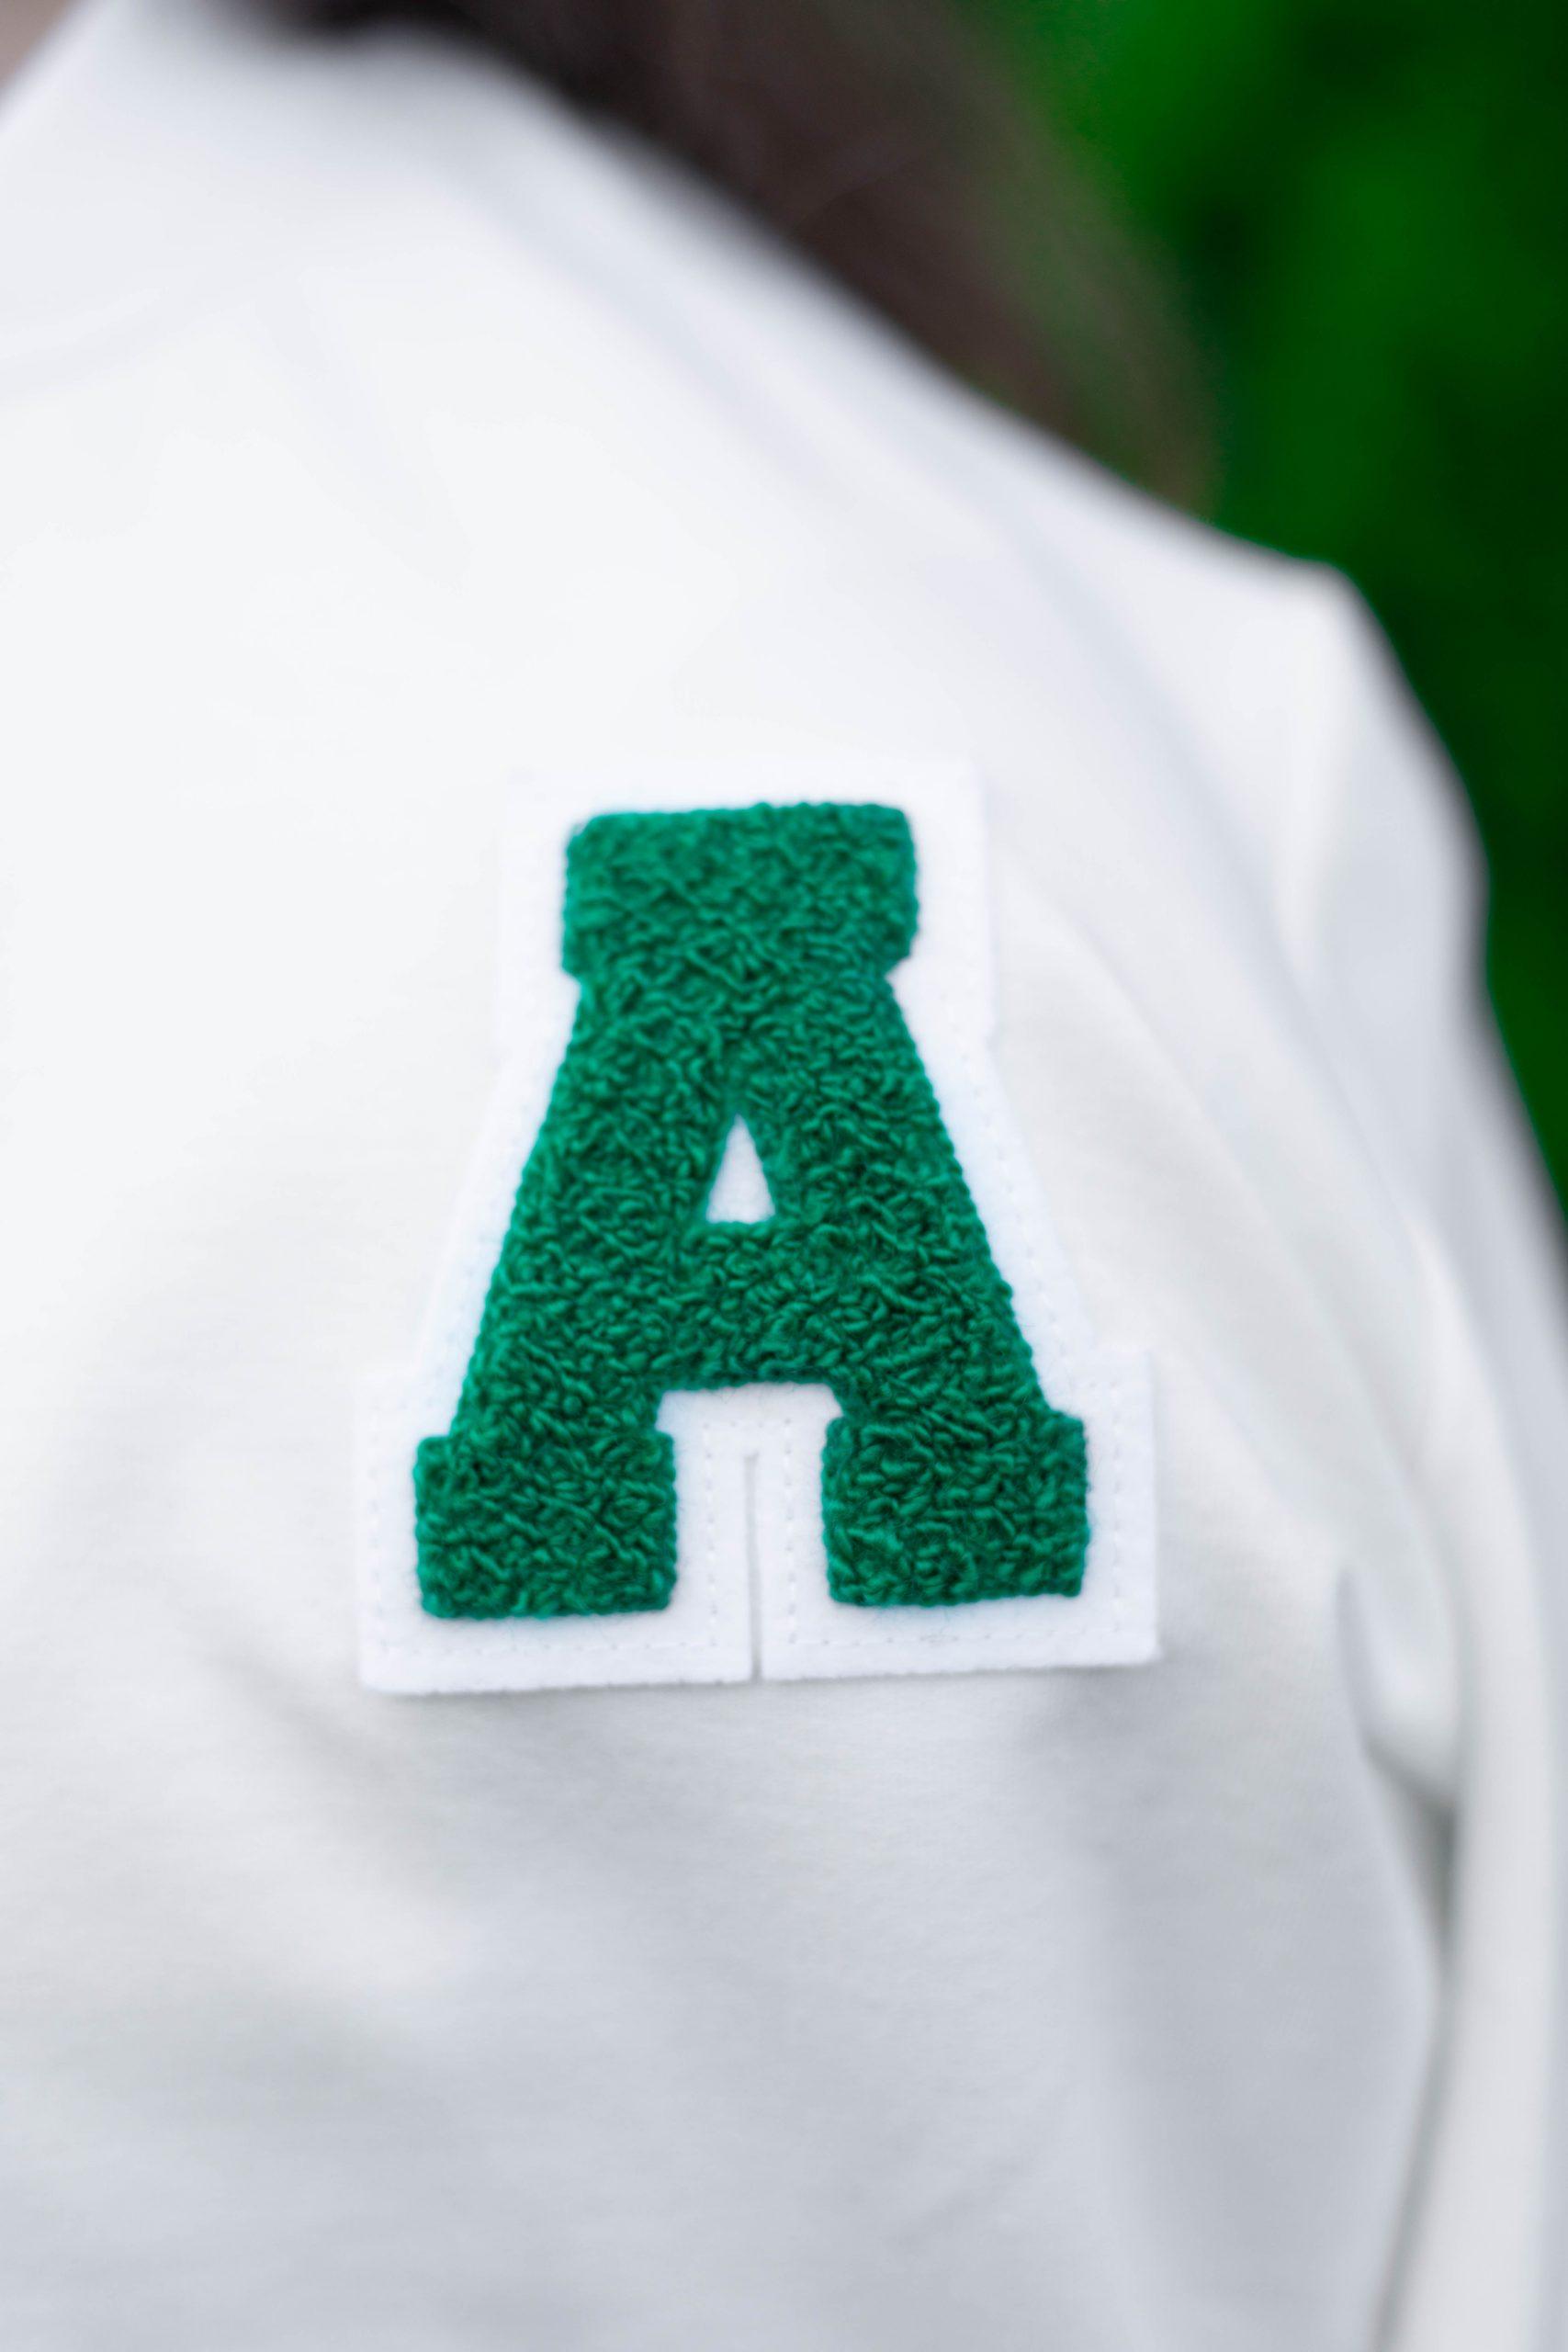 Hedge New York Luxury Tennis & Golf Gear Styled by Annie Fairfax